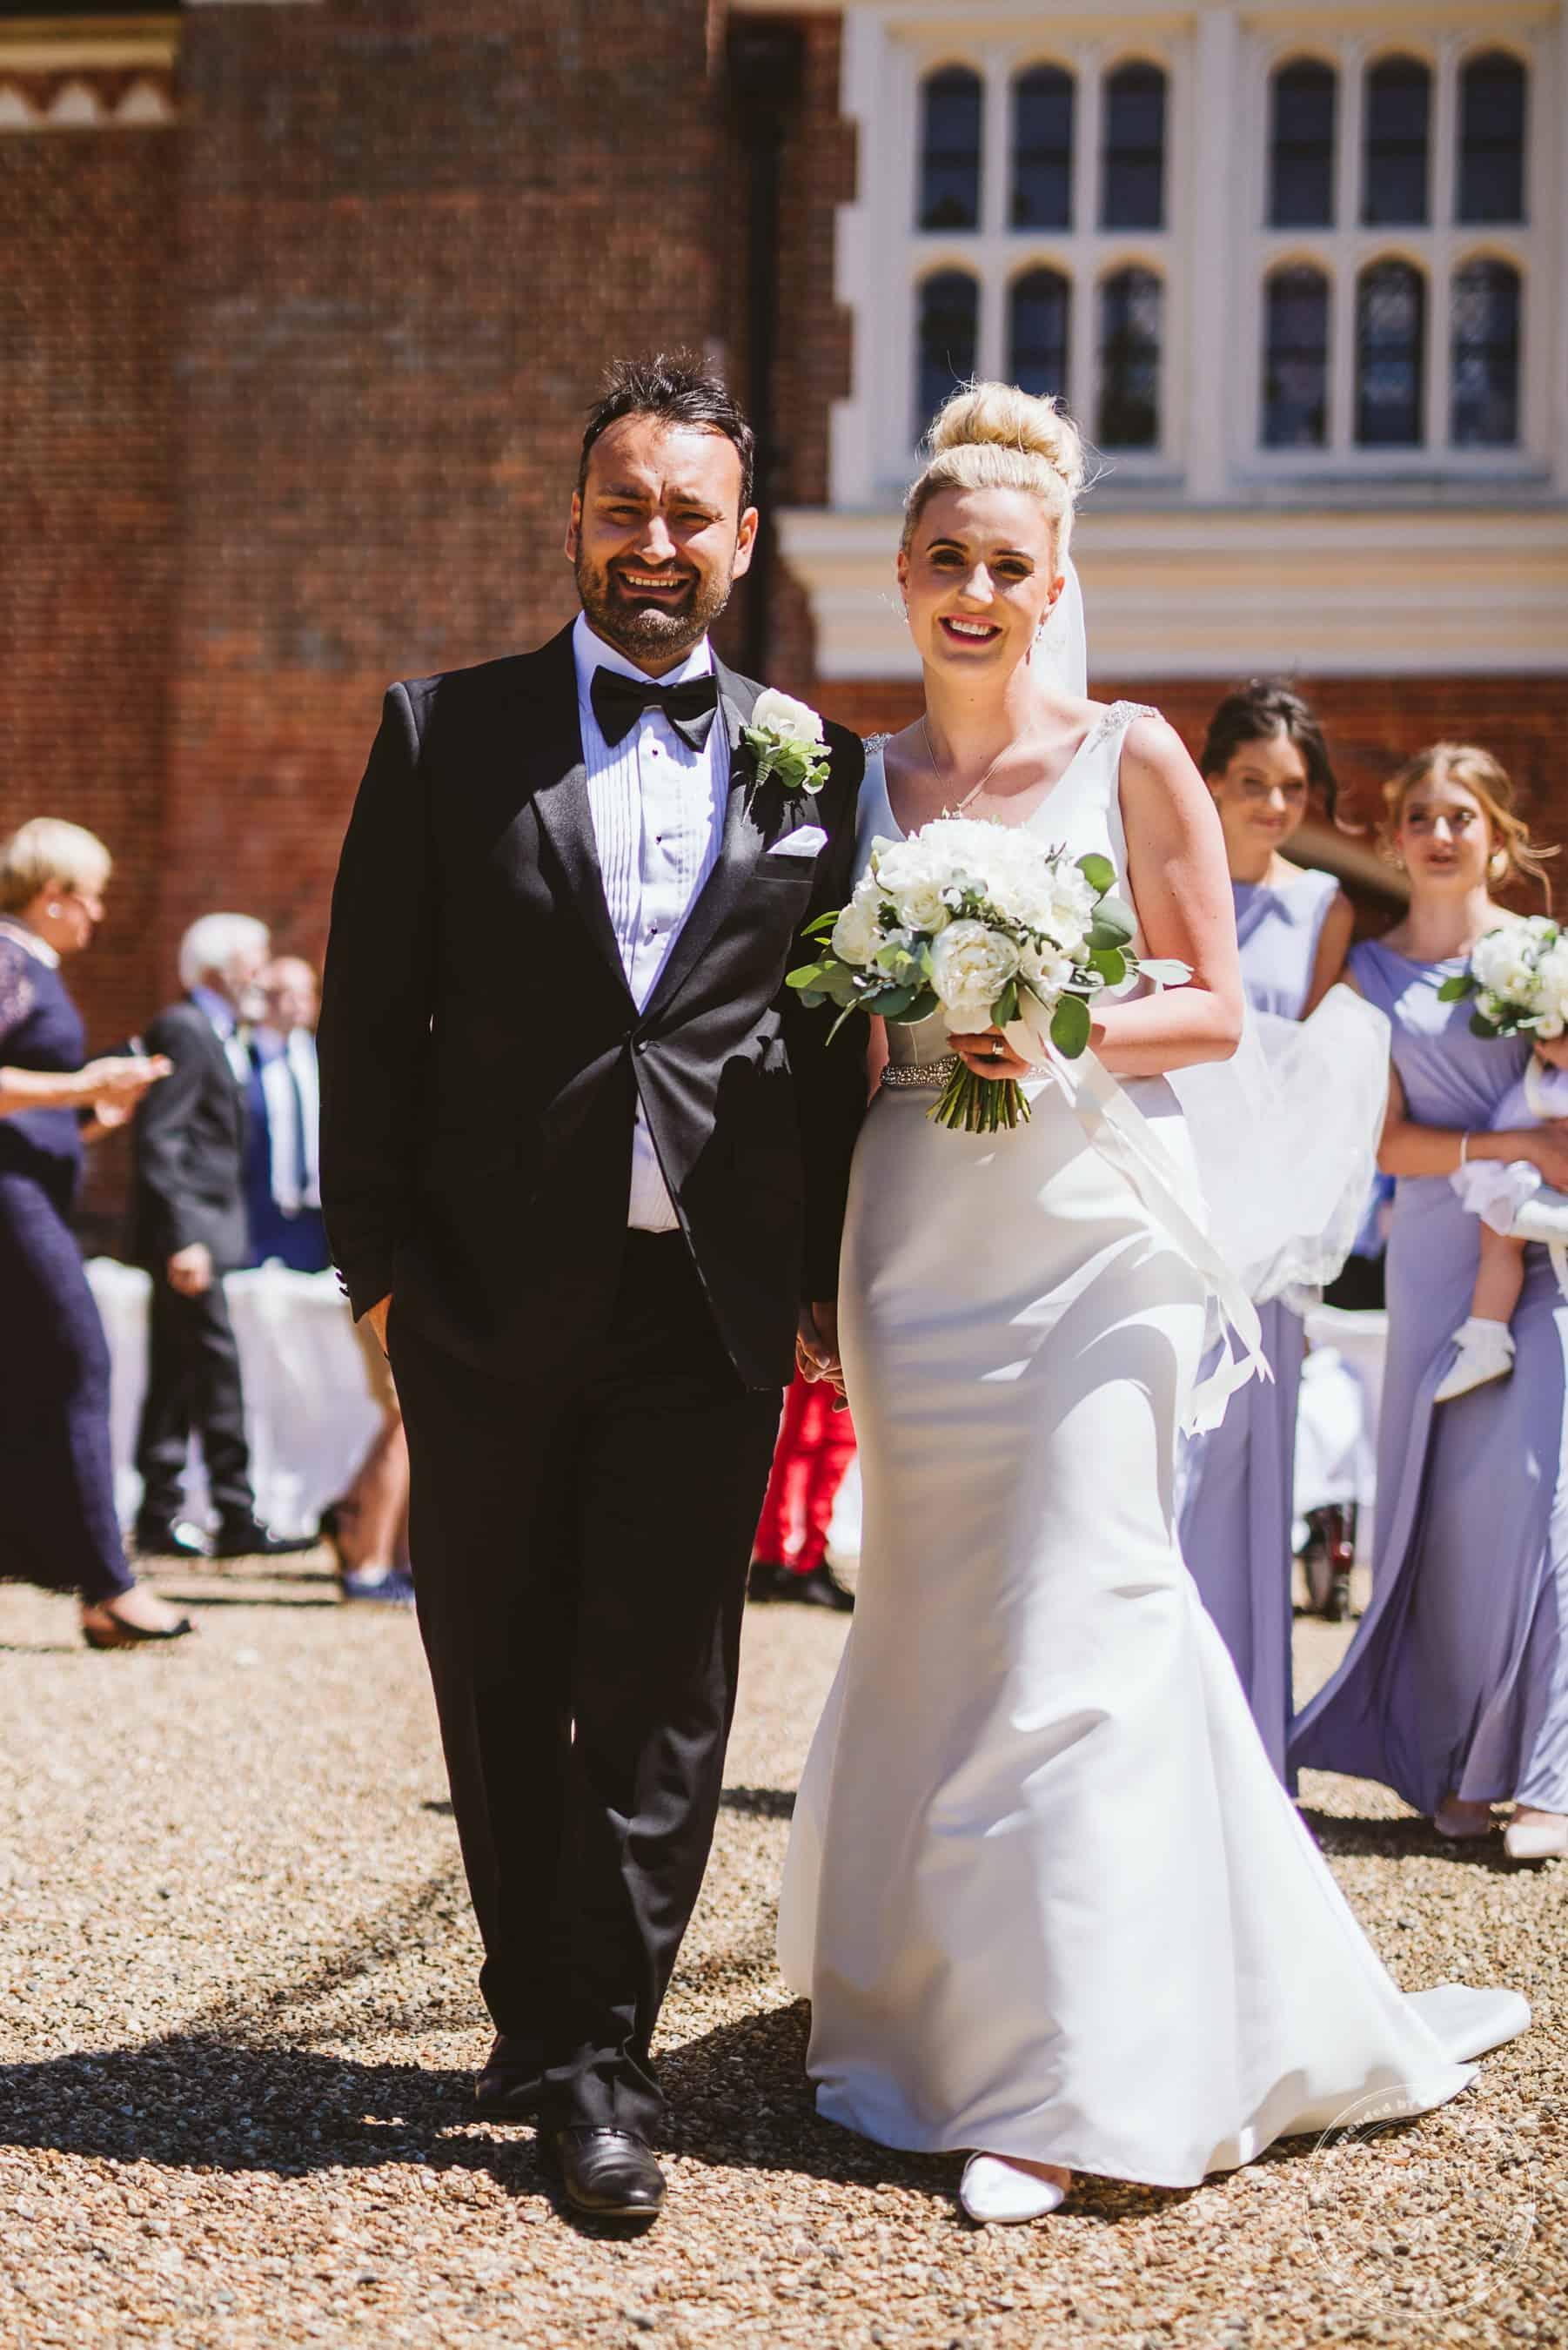 220618 Gosfield Hall Wedding Photography Lavenham Photographic 0094